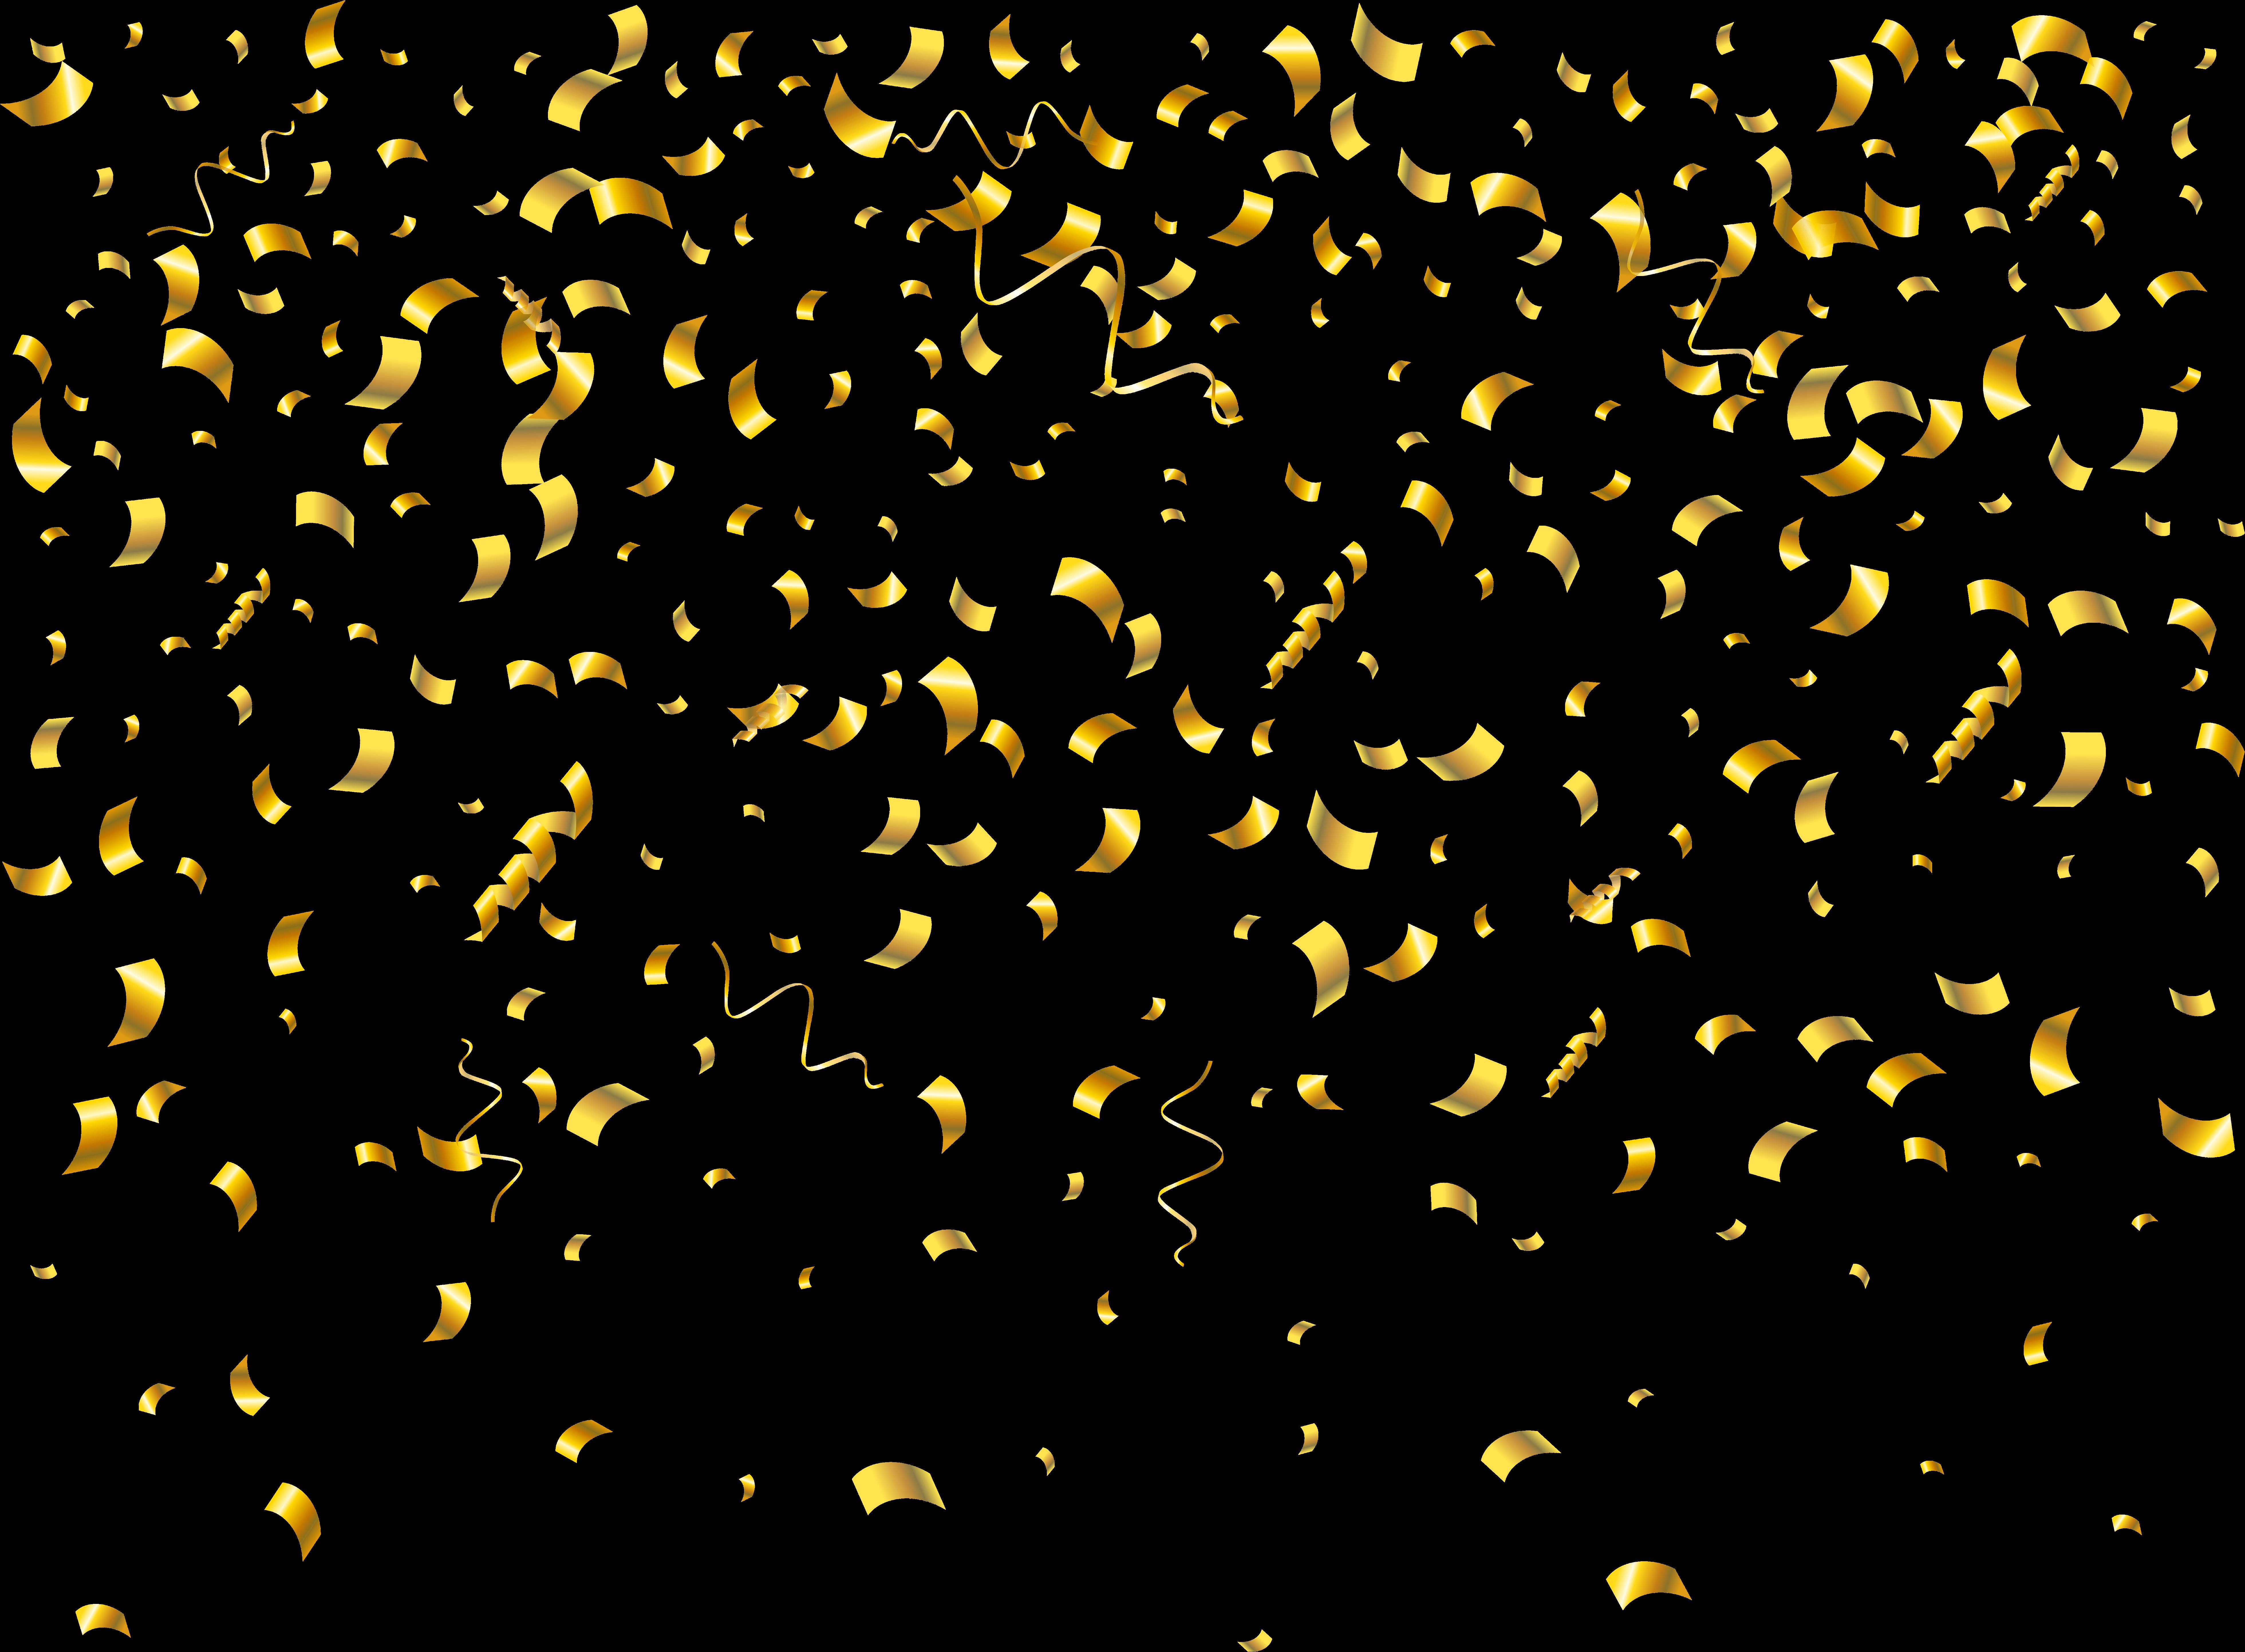 glitter confetti png - Confetti Transparent Clip Art Png ...